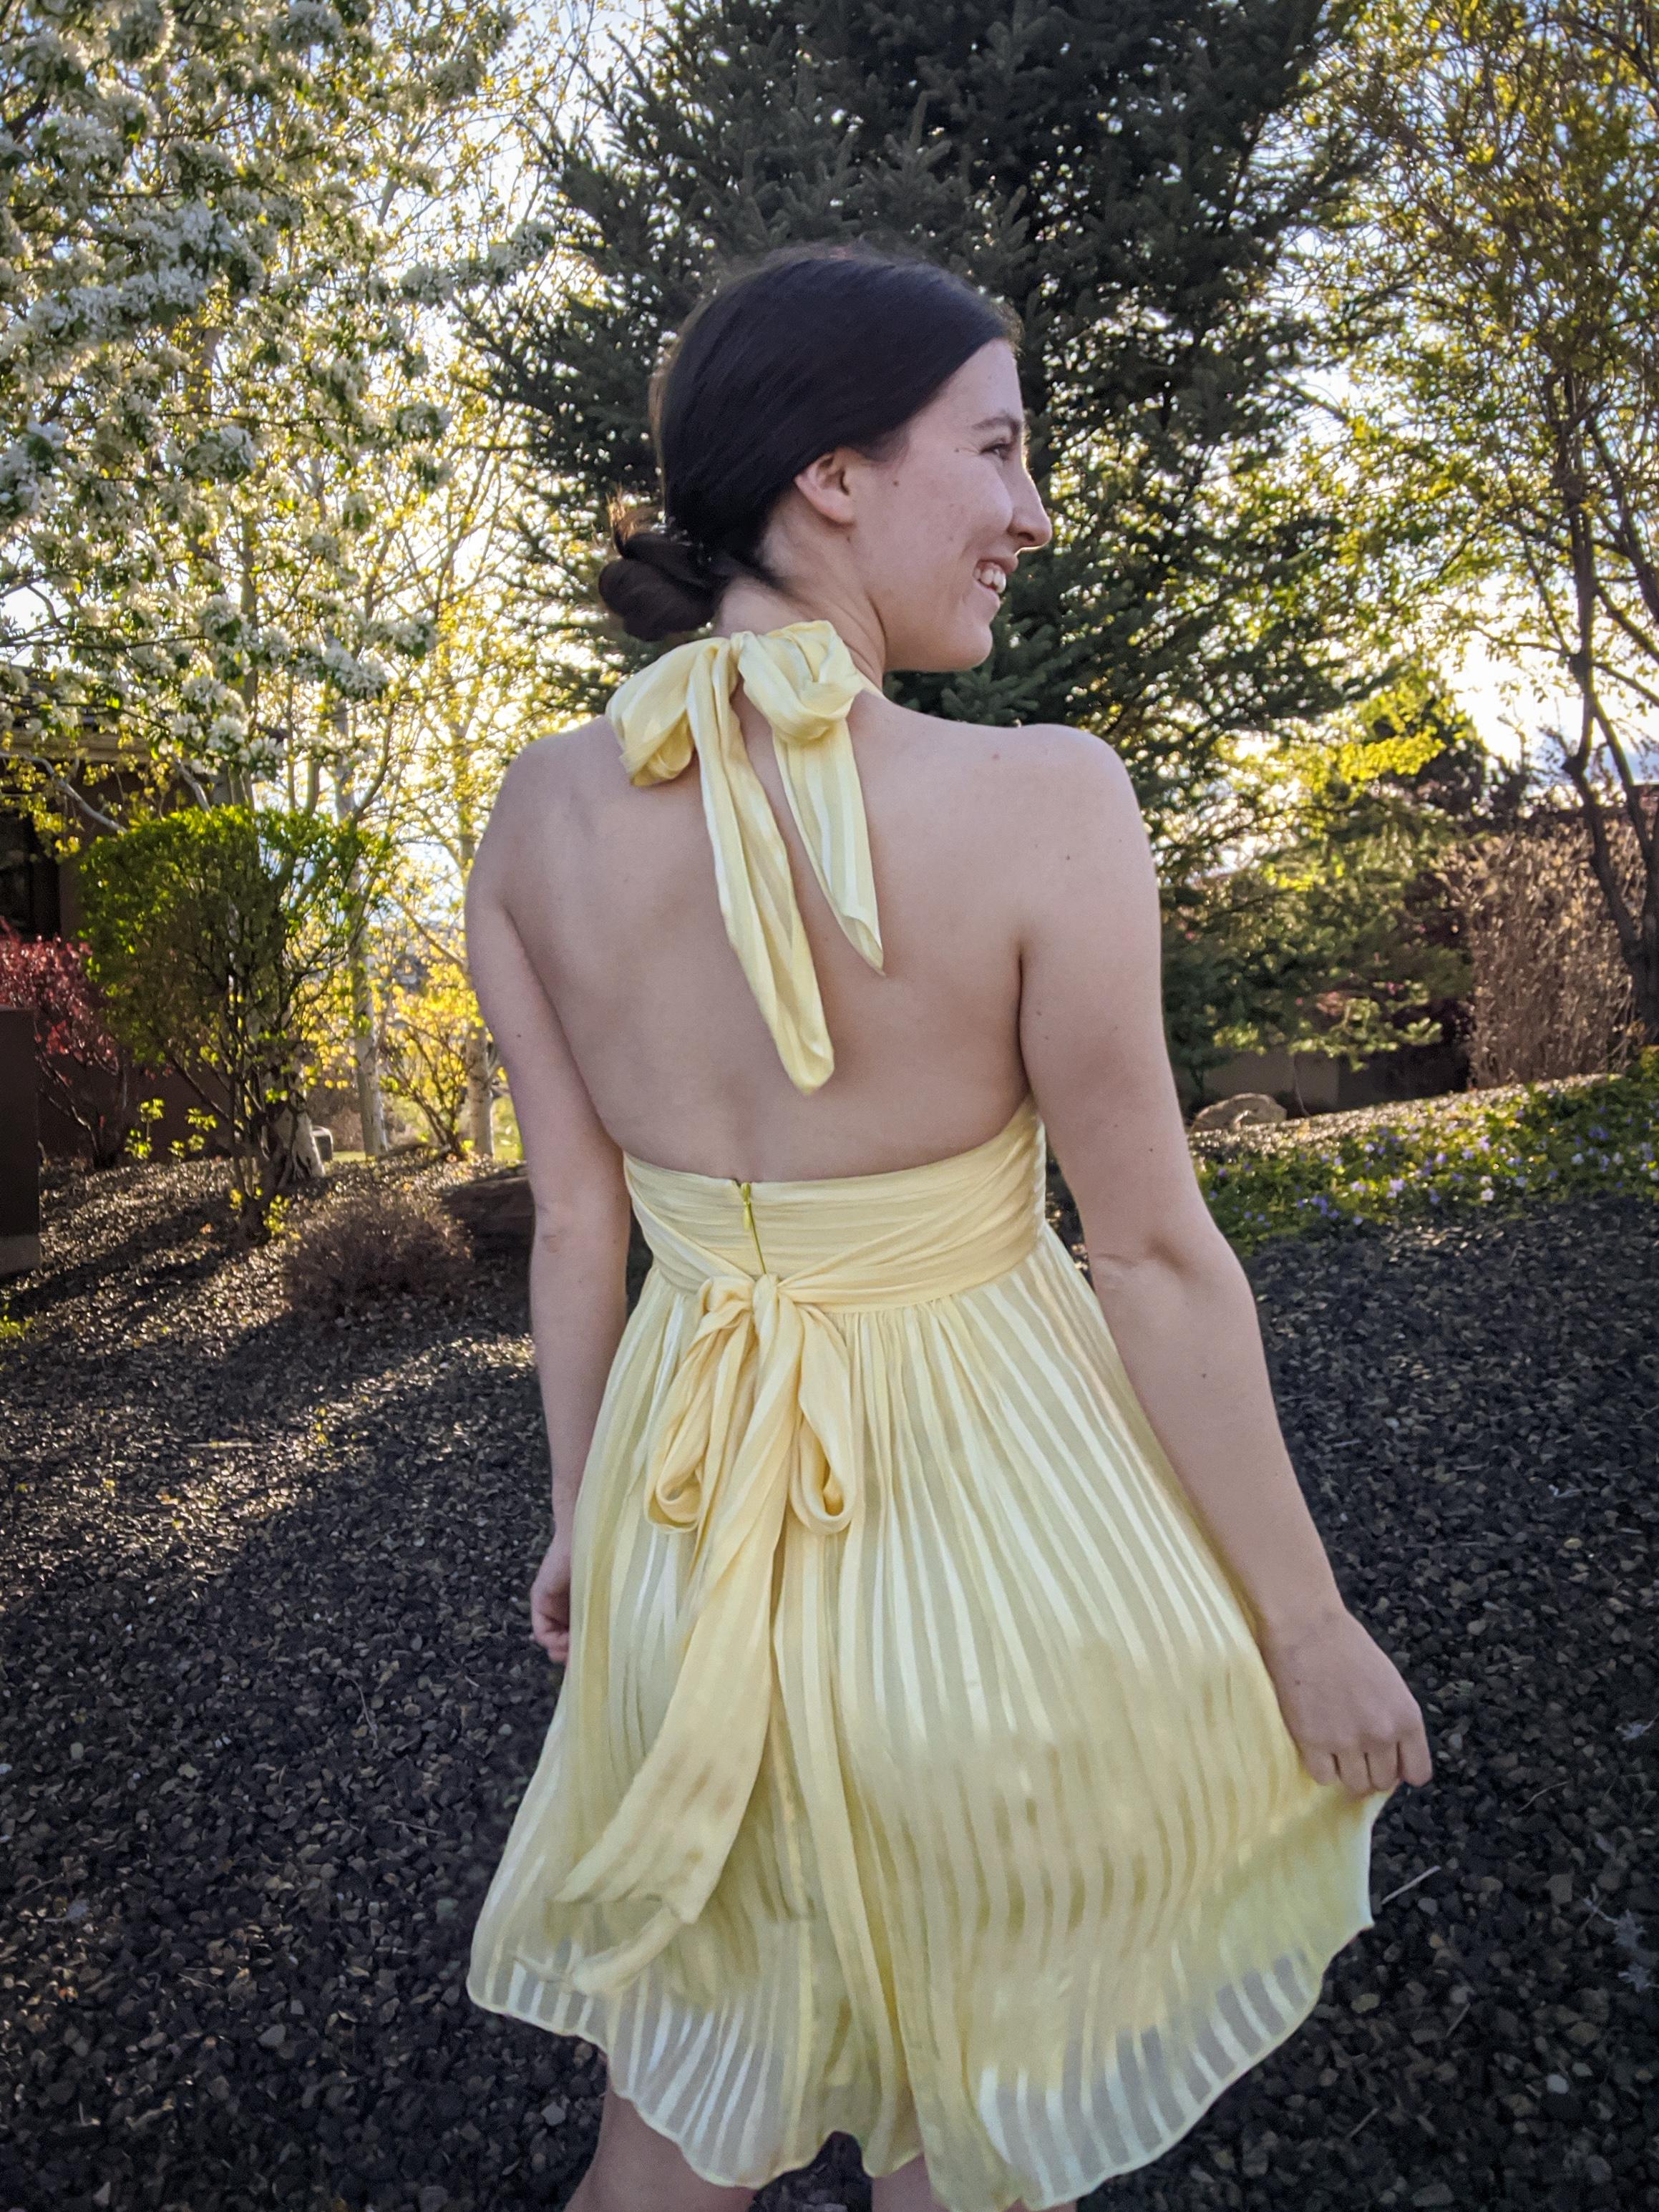 thrift shopping, yellow pleated dress, Assistance League Las Vegas